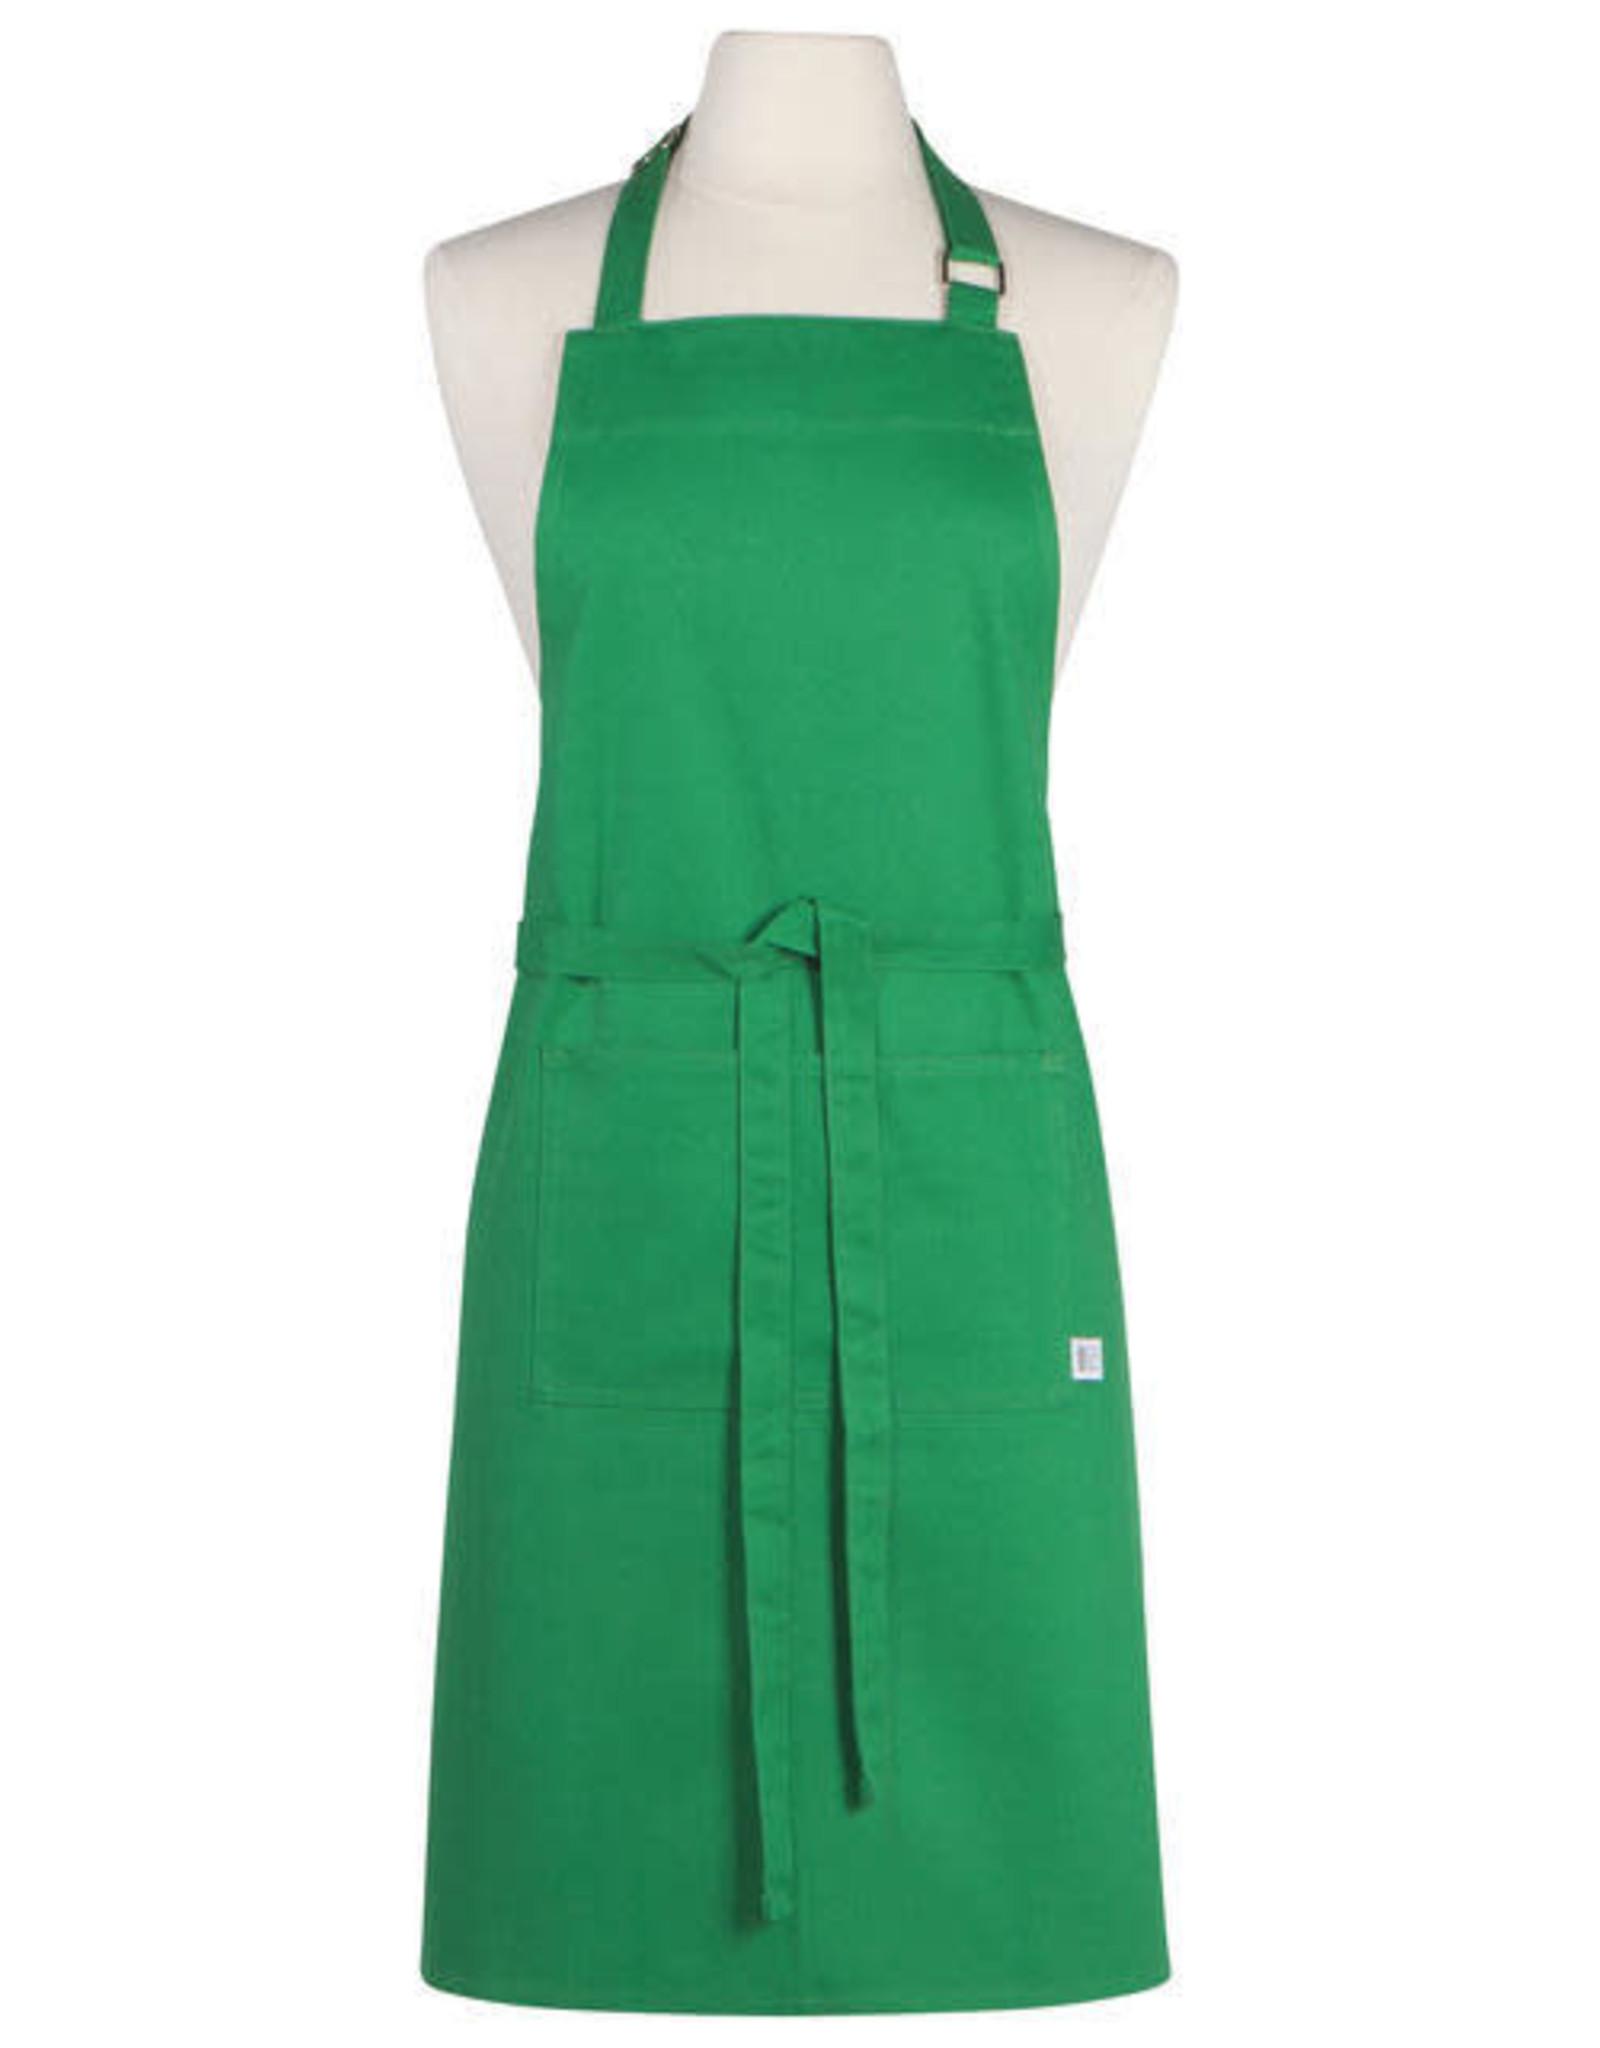 Danica Danica - Apron - Chef Greenbriar